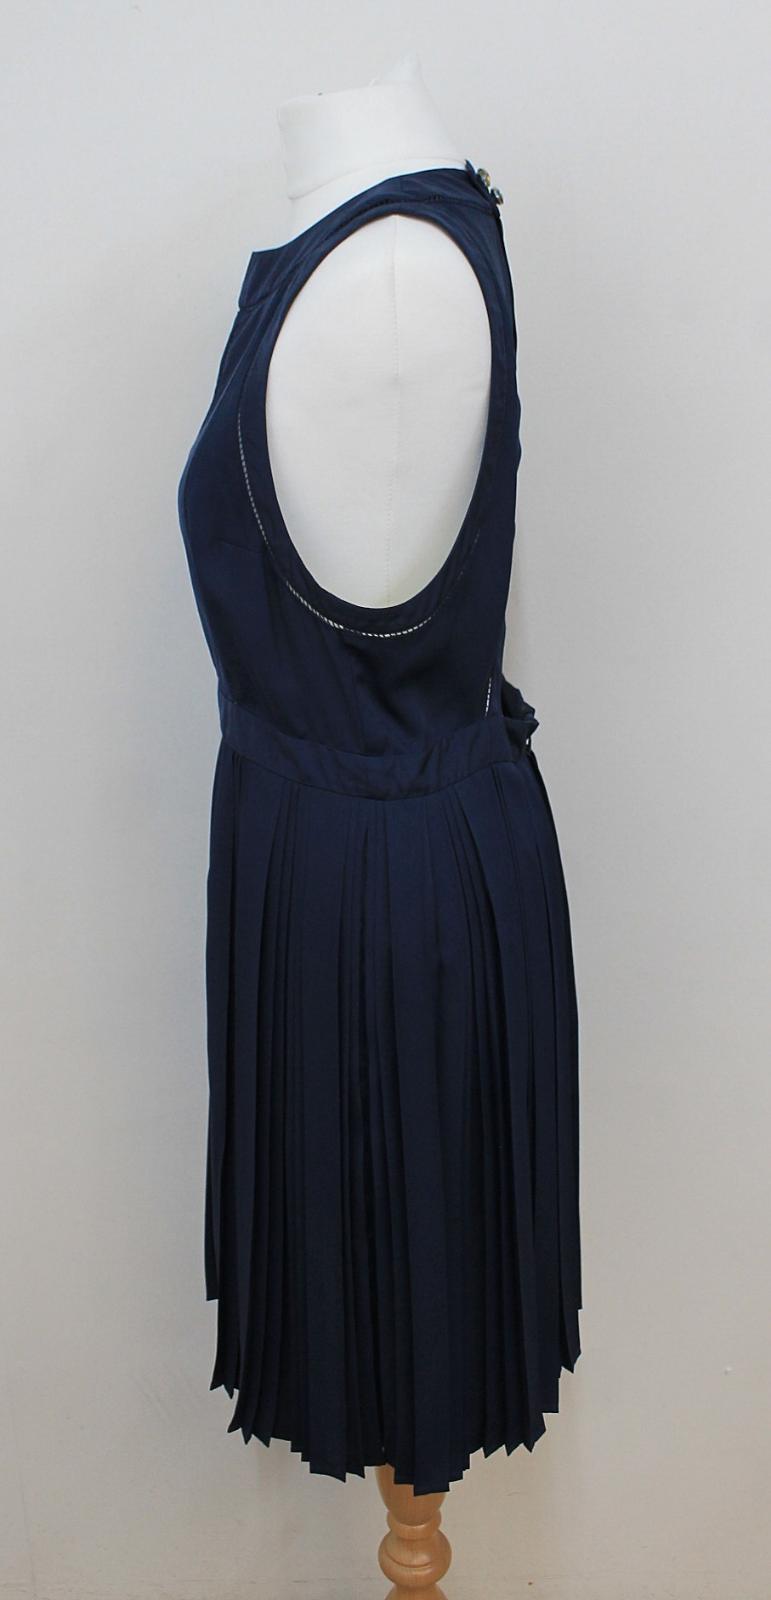 KENZO-PARIS-Ladies-Navy-Blue-Neon-Yellow-Sleeveless-Shift-Dress-FR42-UK14 thumbnail 5